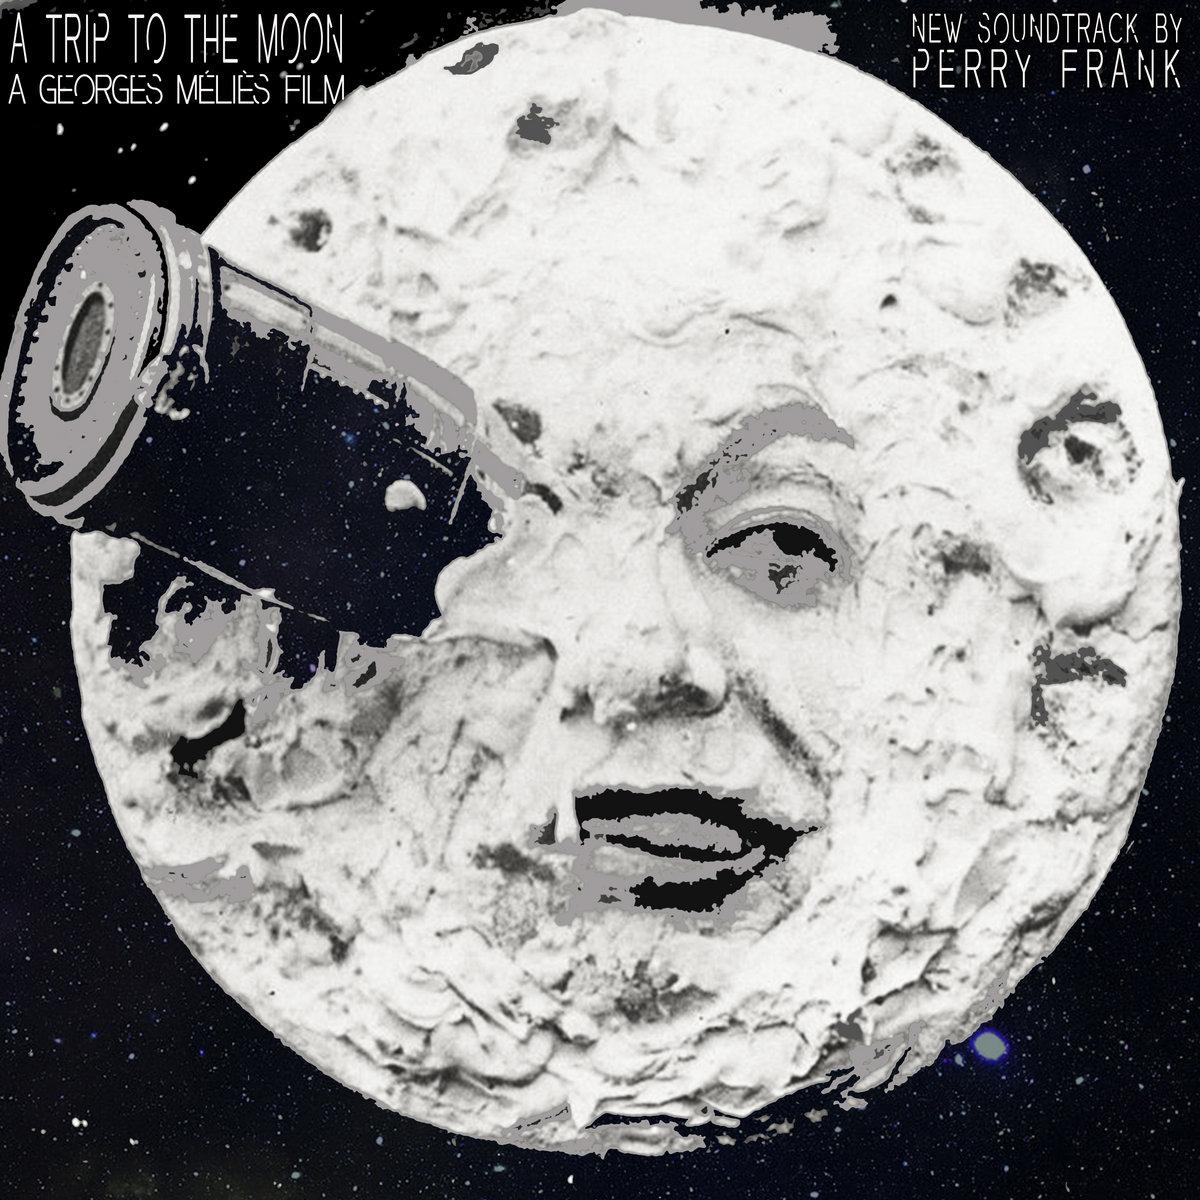 Perry Frank - A Trip To The Moon - A Georges Melies film - Francesco Perra - Bandcamp - player - 2019 - Sa Scena Sarda